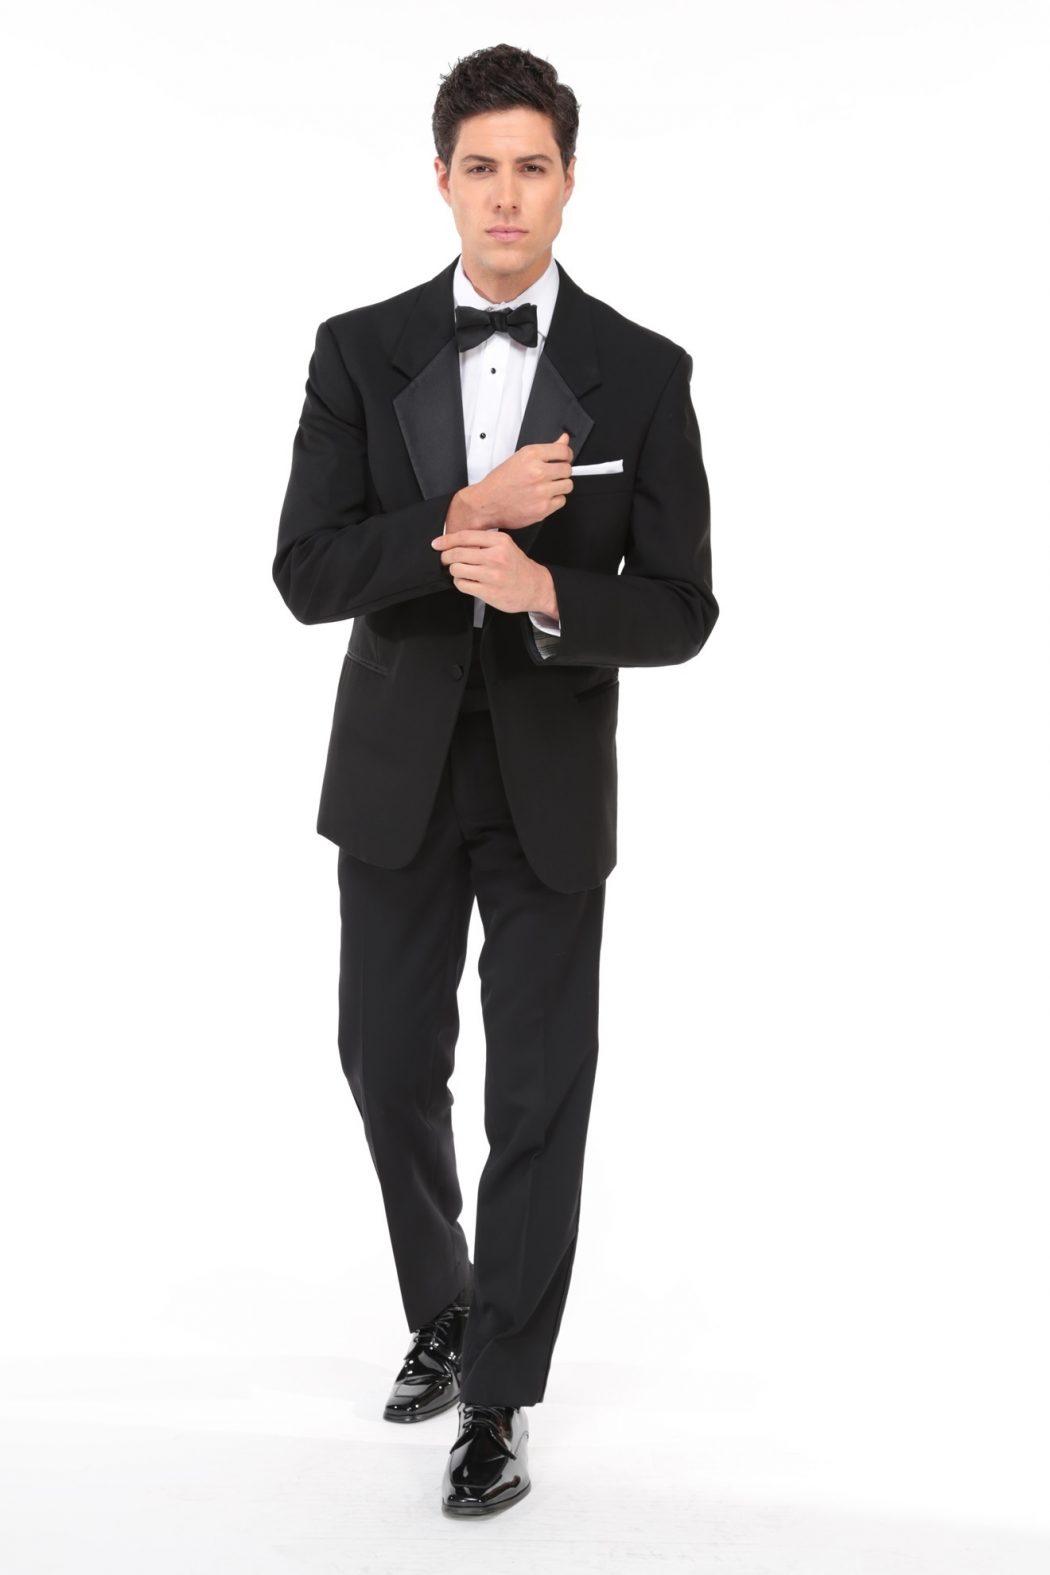 Classic-Black-Tuxedo4 6 Trendy Weddings Outfit Ideas for Men